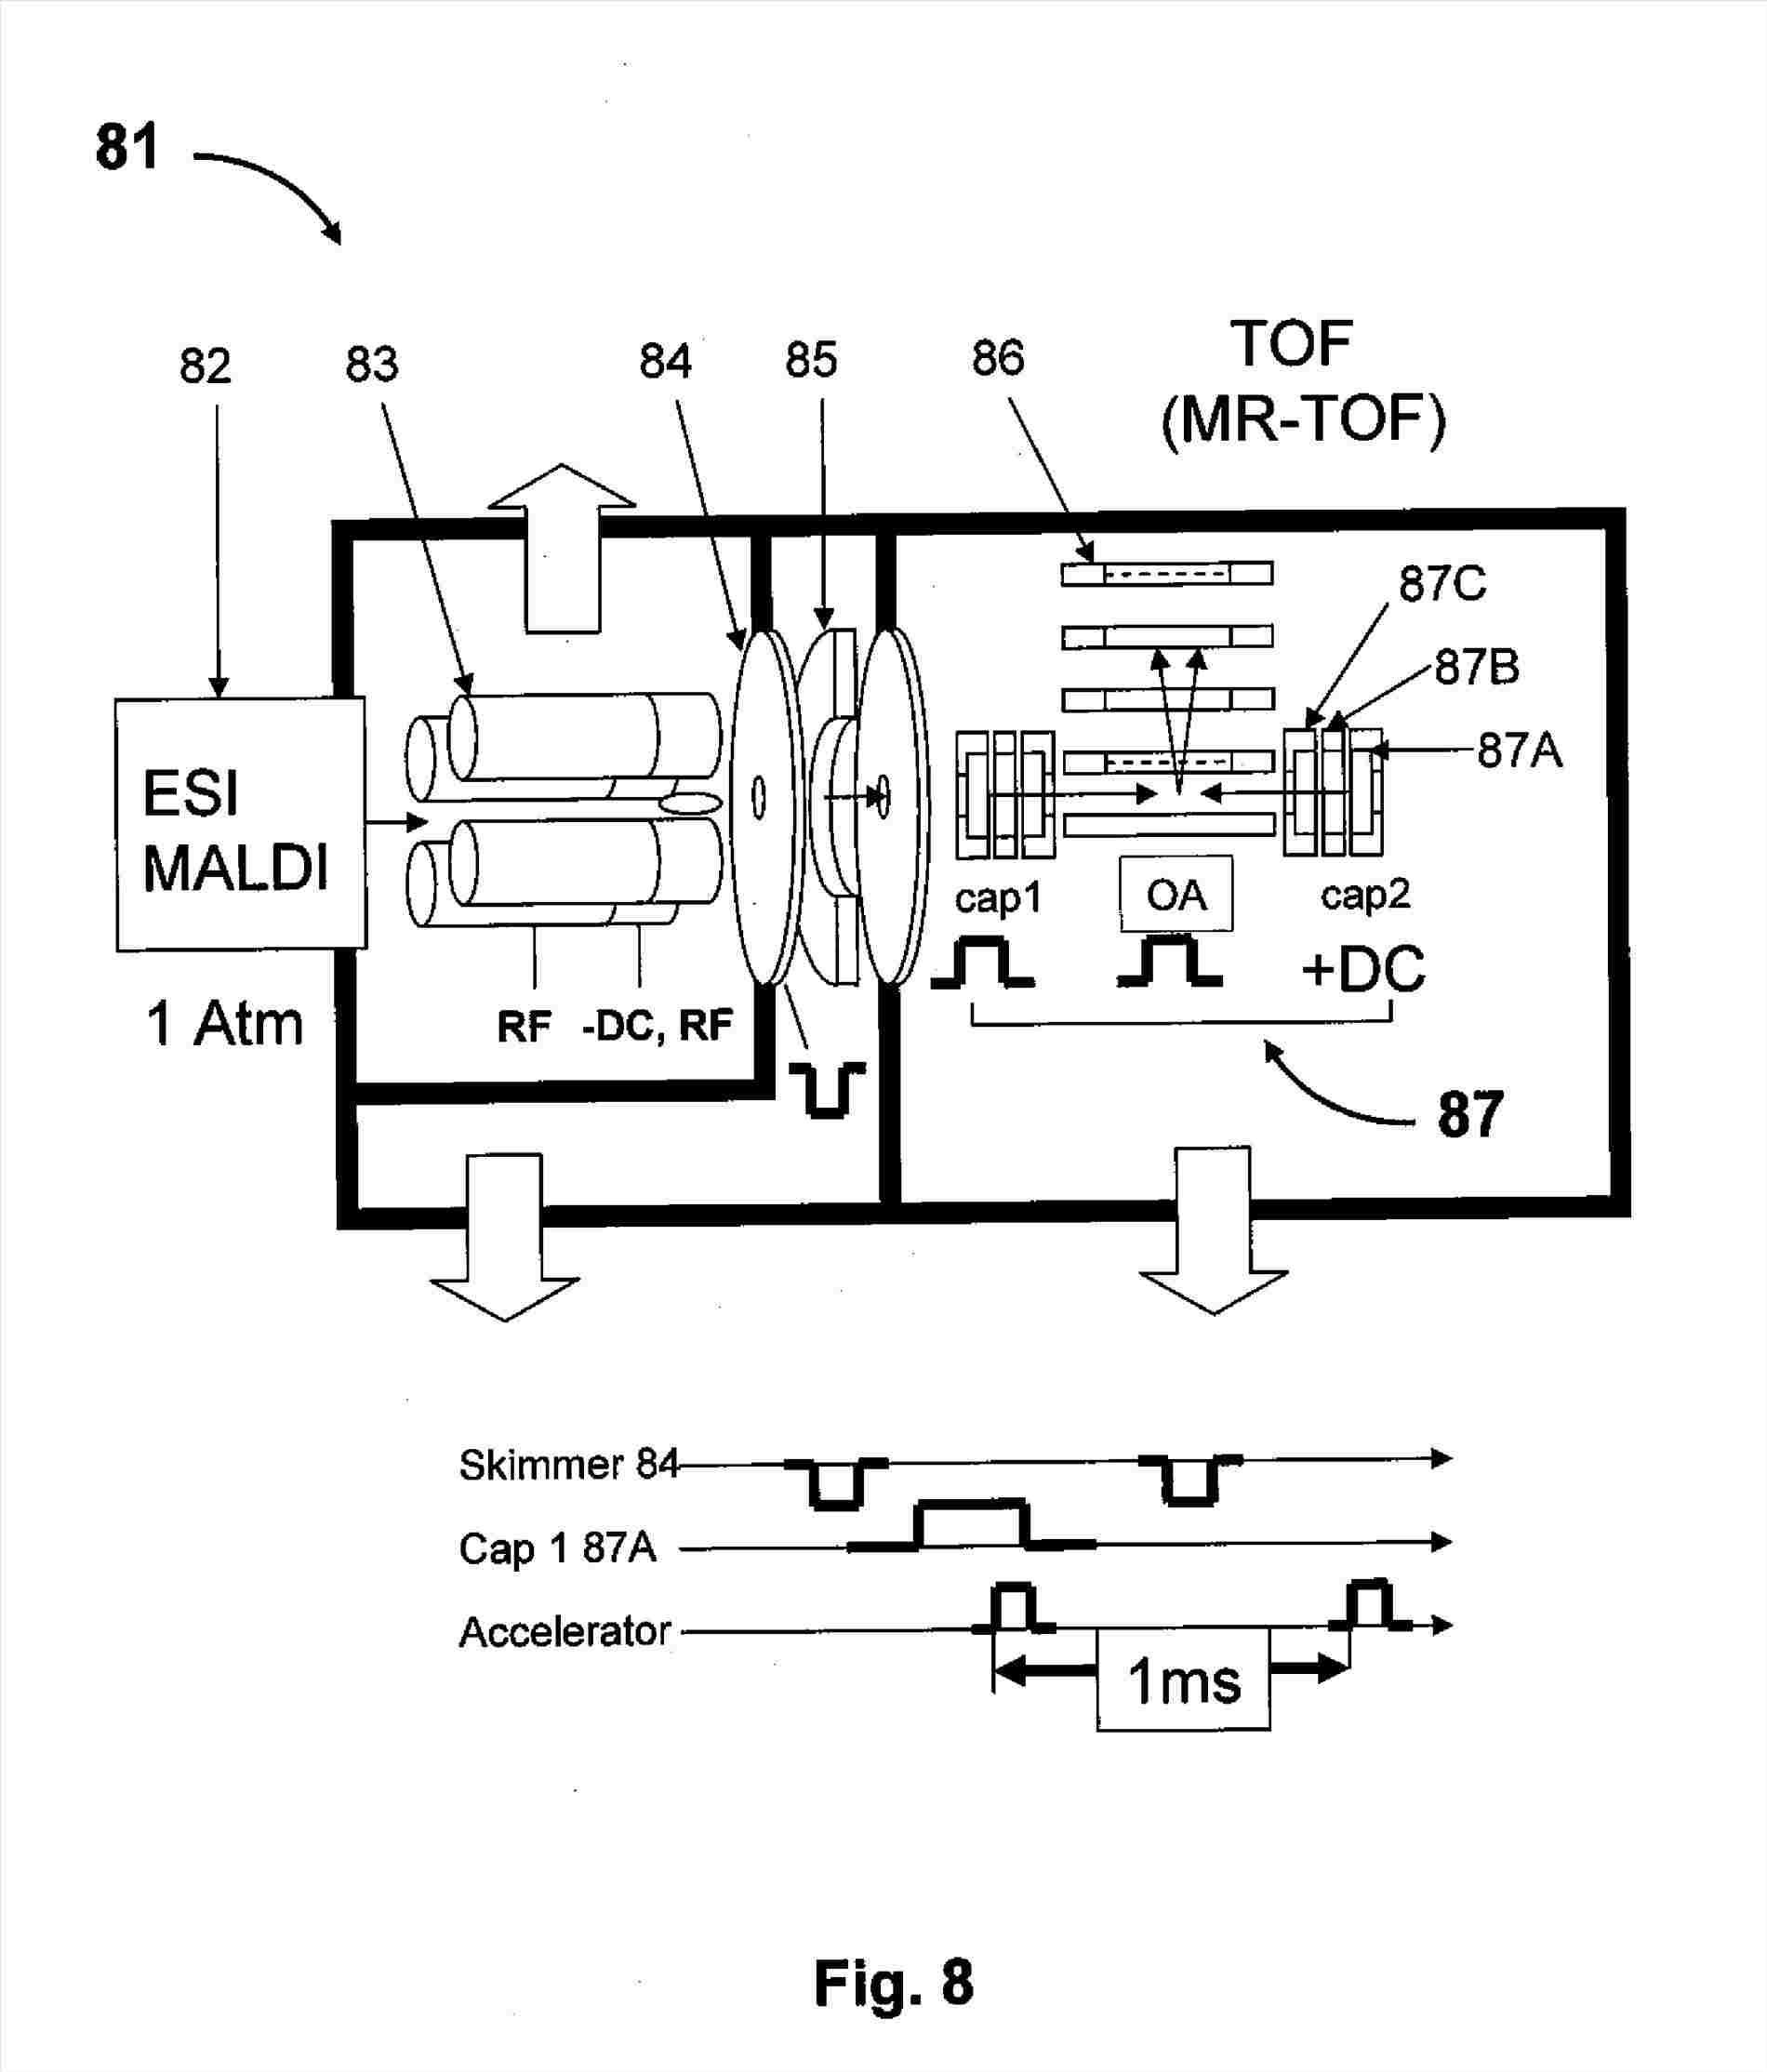 Inilex Gps Wiring Diagram from annawiringdiagram.com